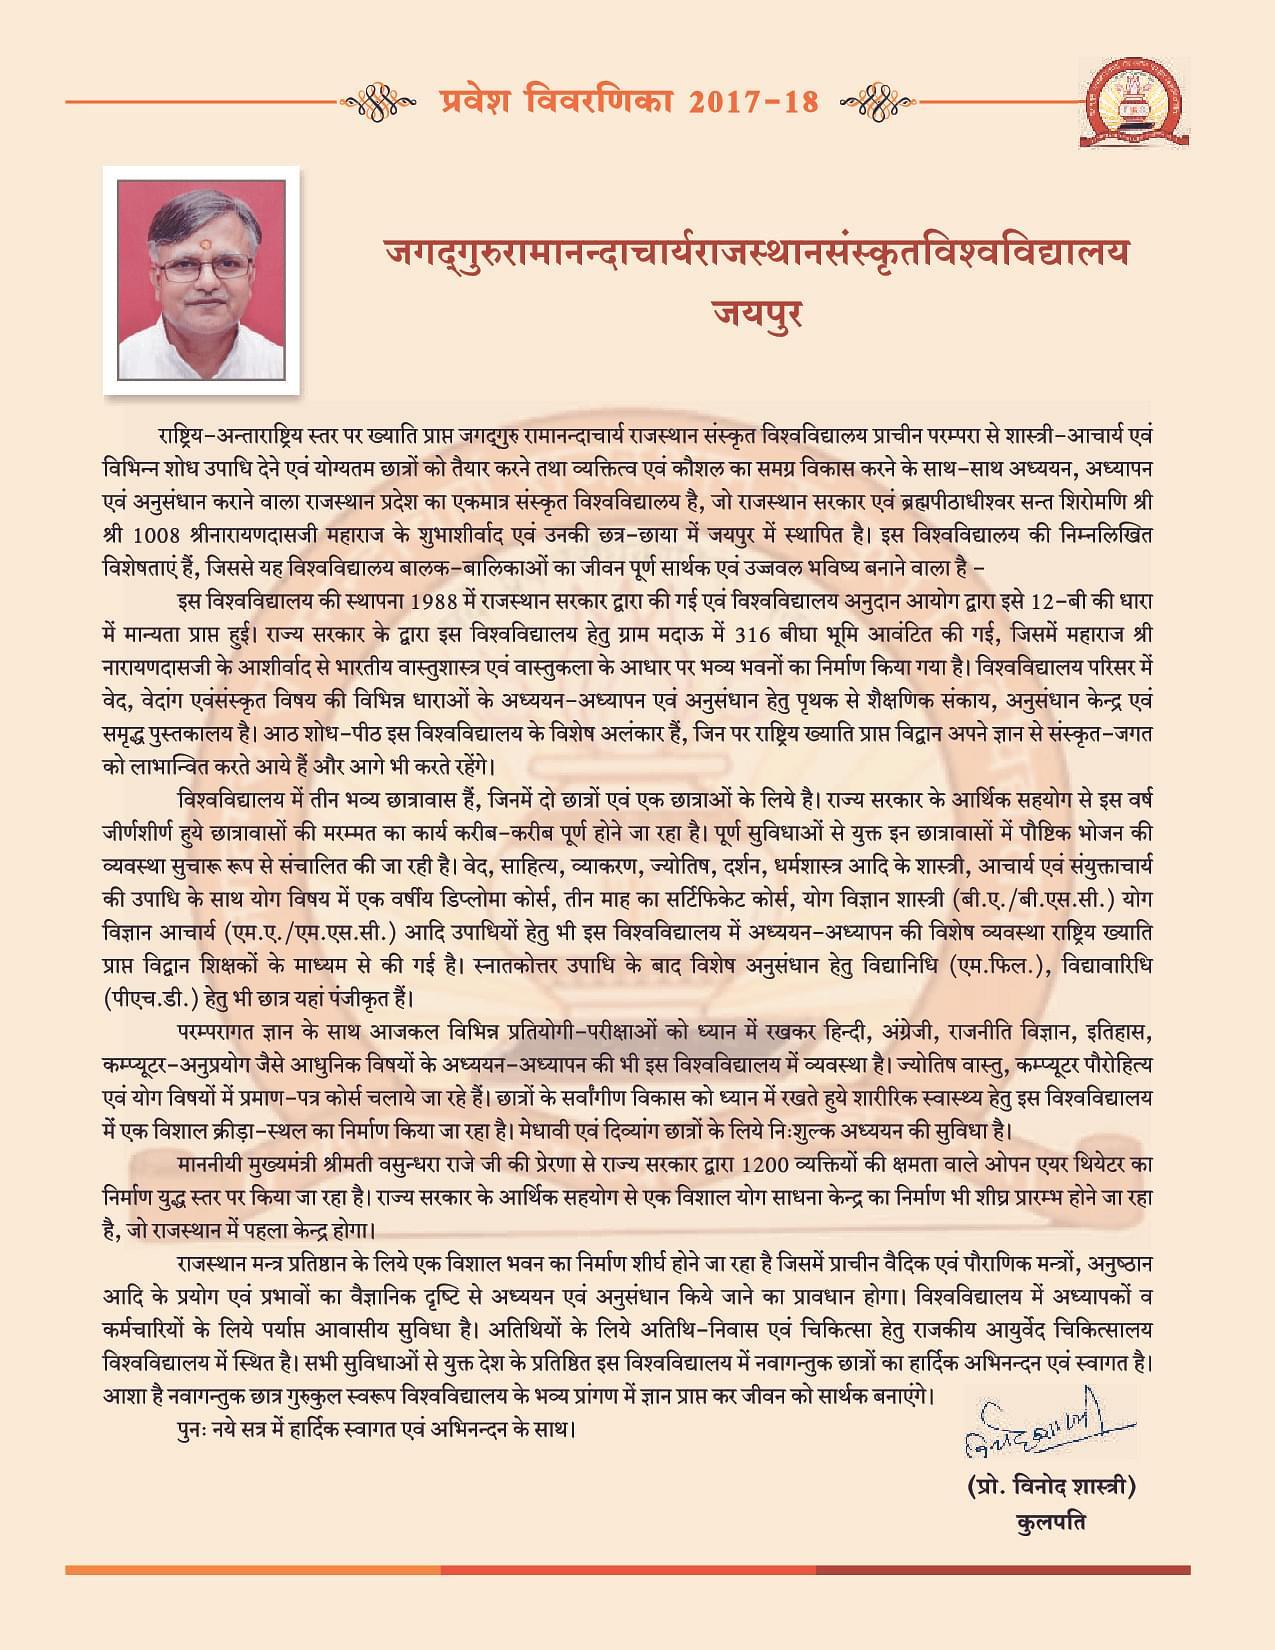 JRRSU Jaipur - Courses, Fees Structure, Admissions 2019-2020